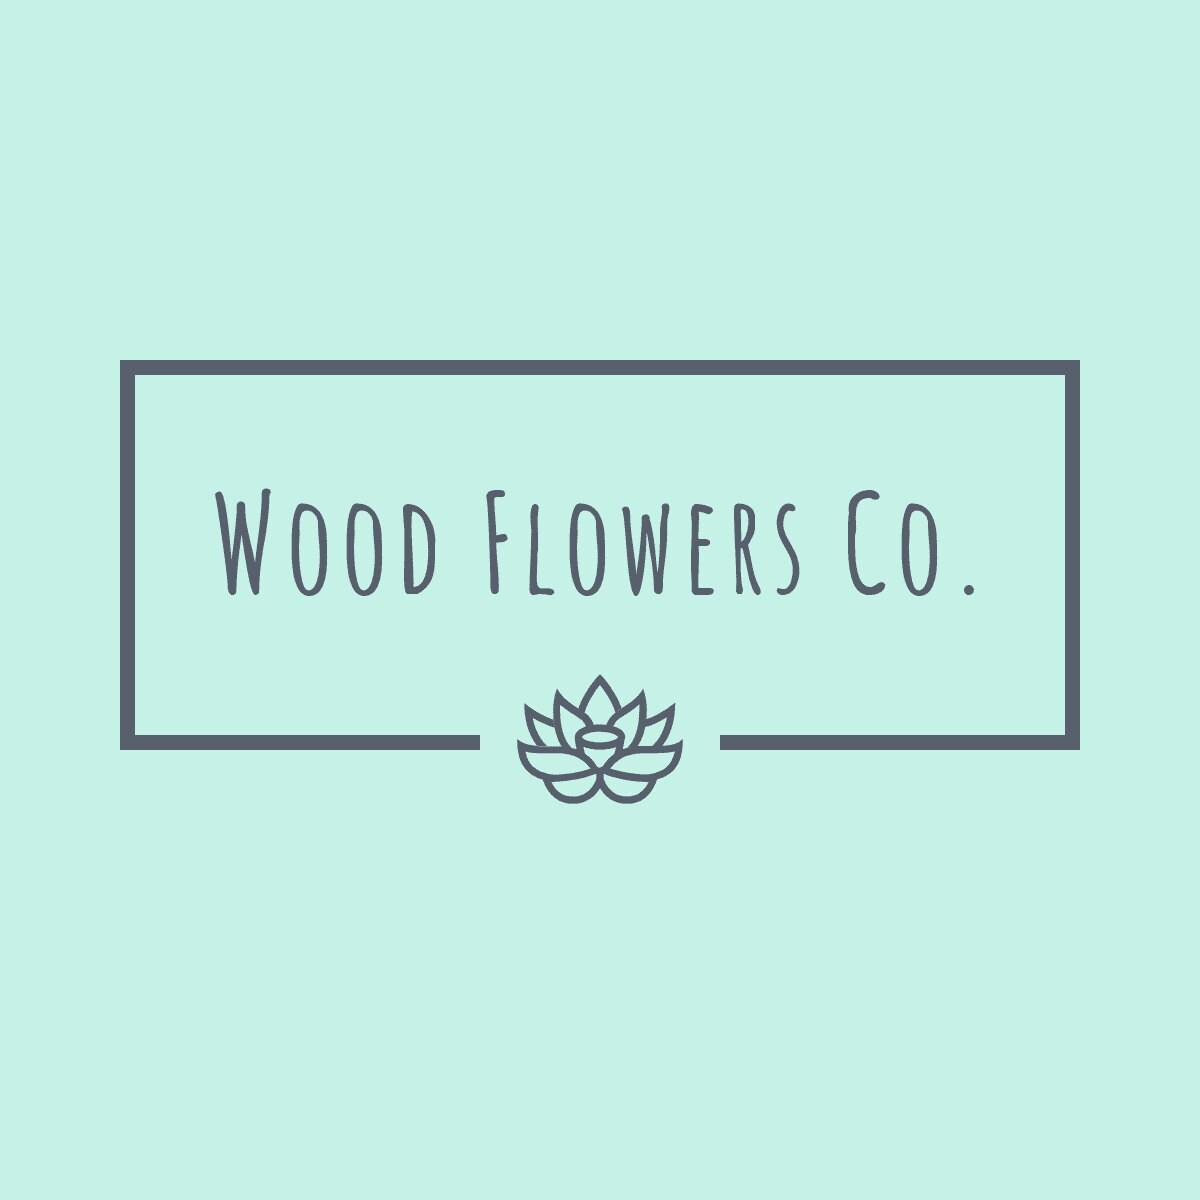 WoodFlowersCo